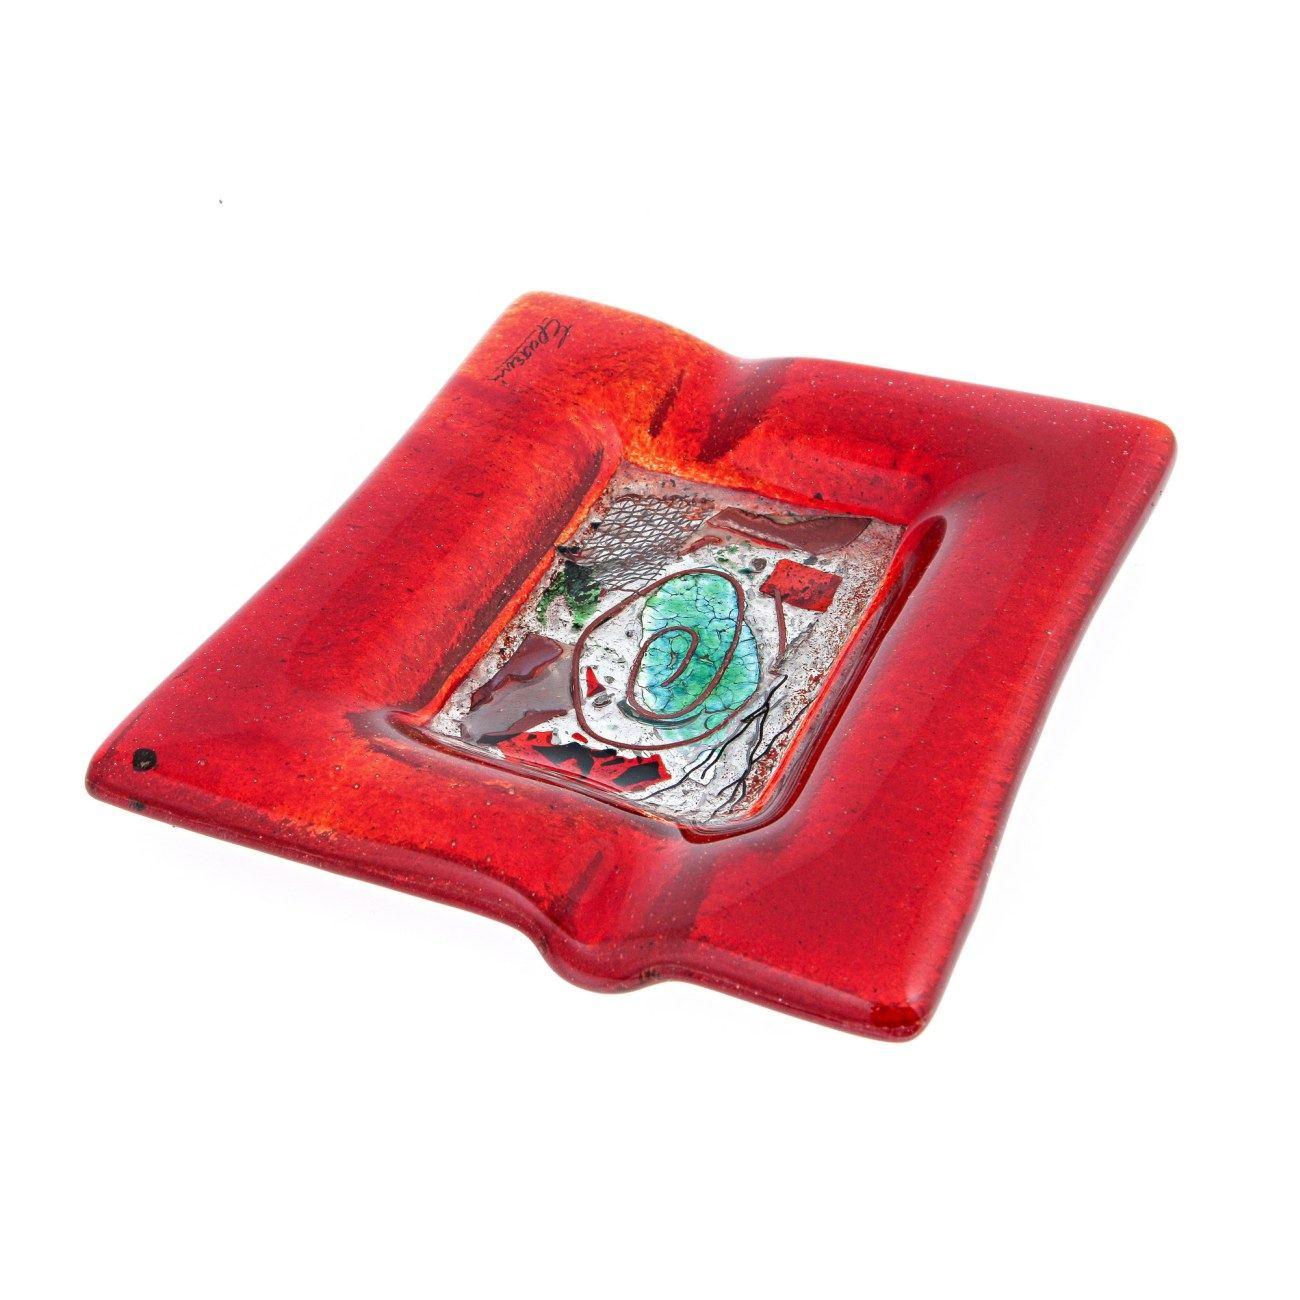 Puzzle Fused Glass Handmade Rectangular Ashtray Decorative Smoking Accessory